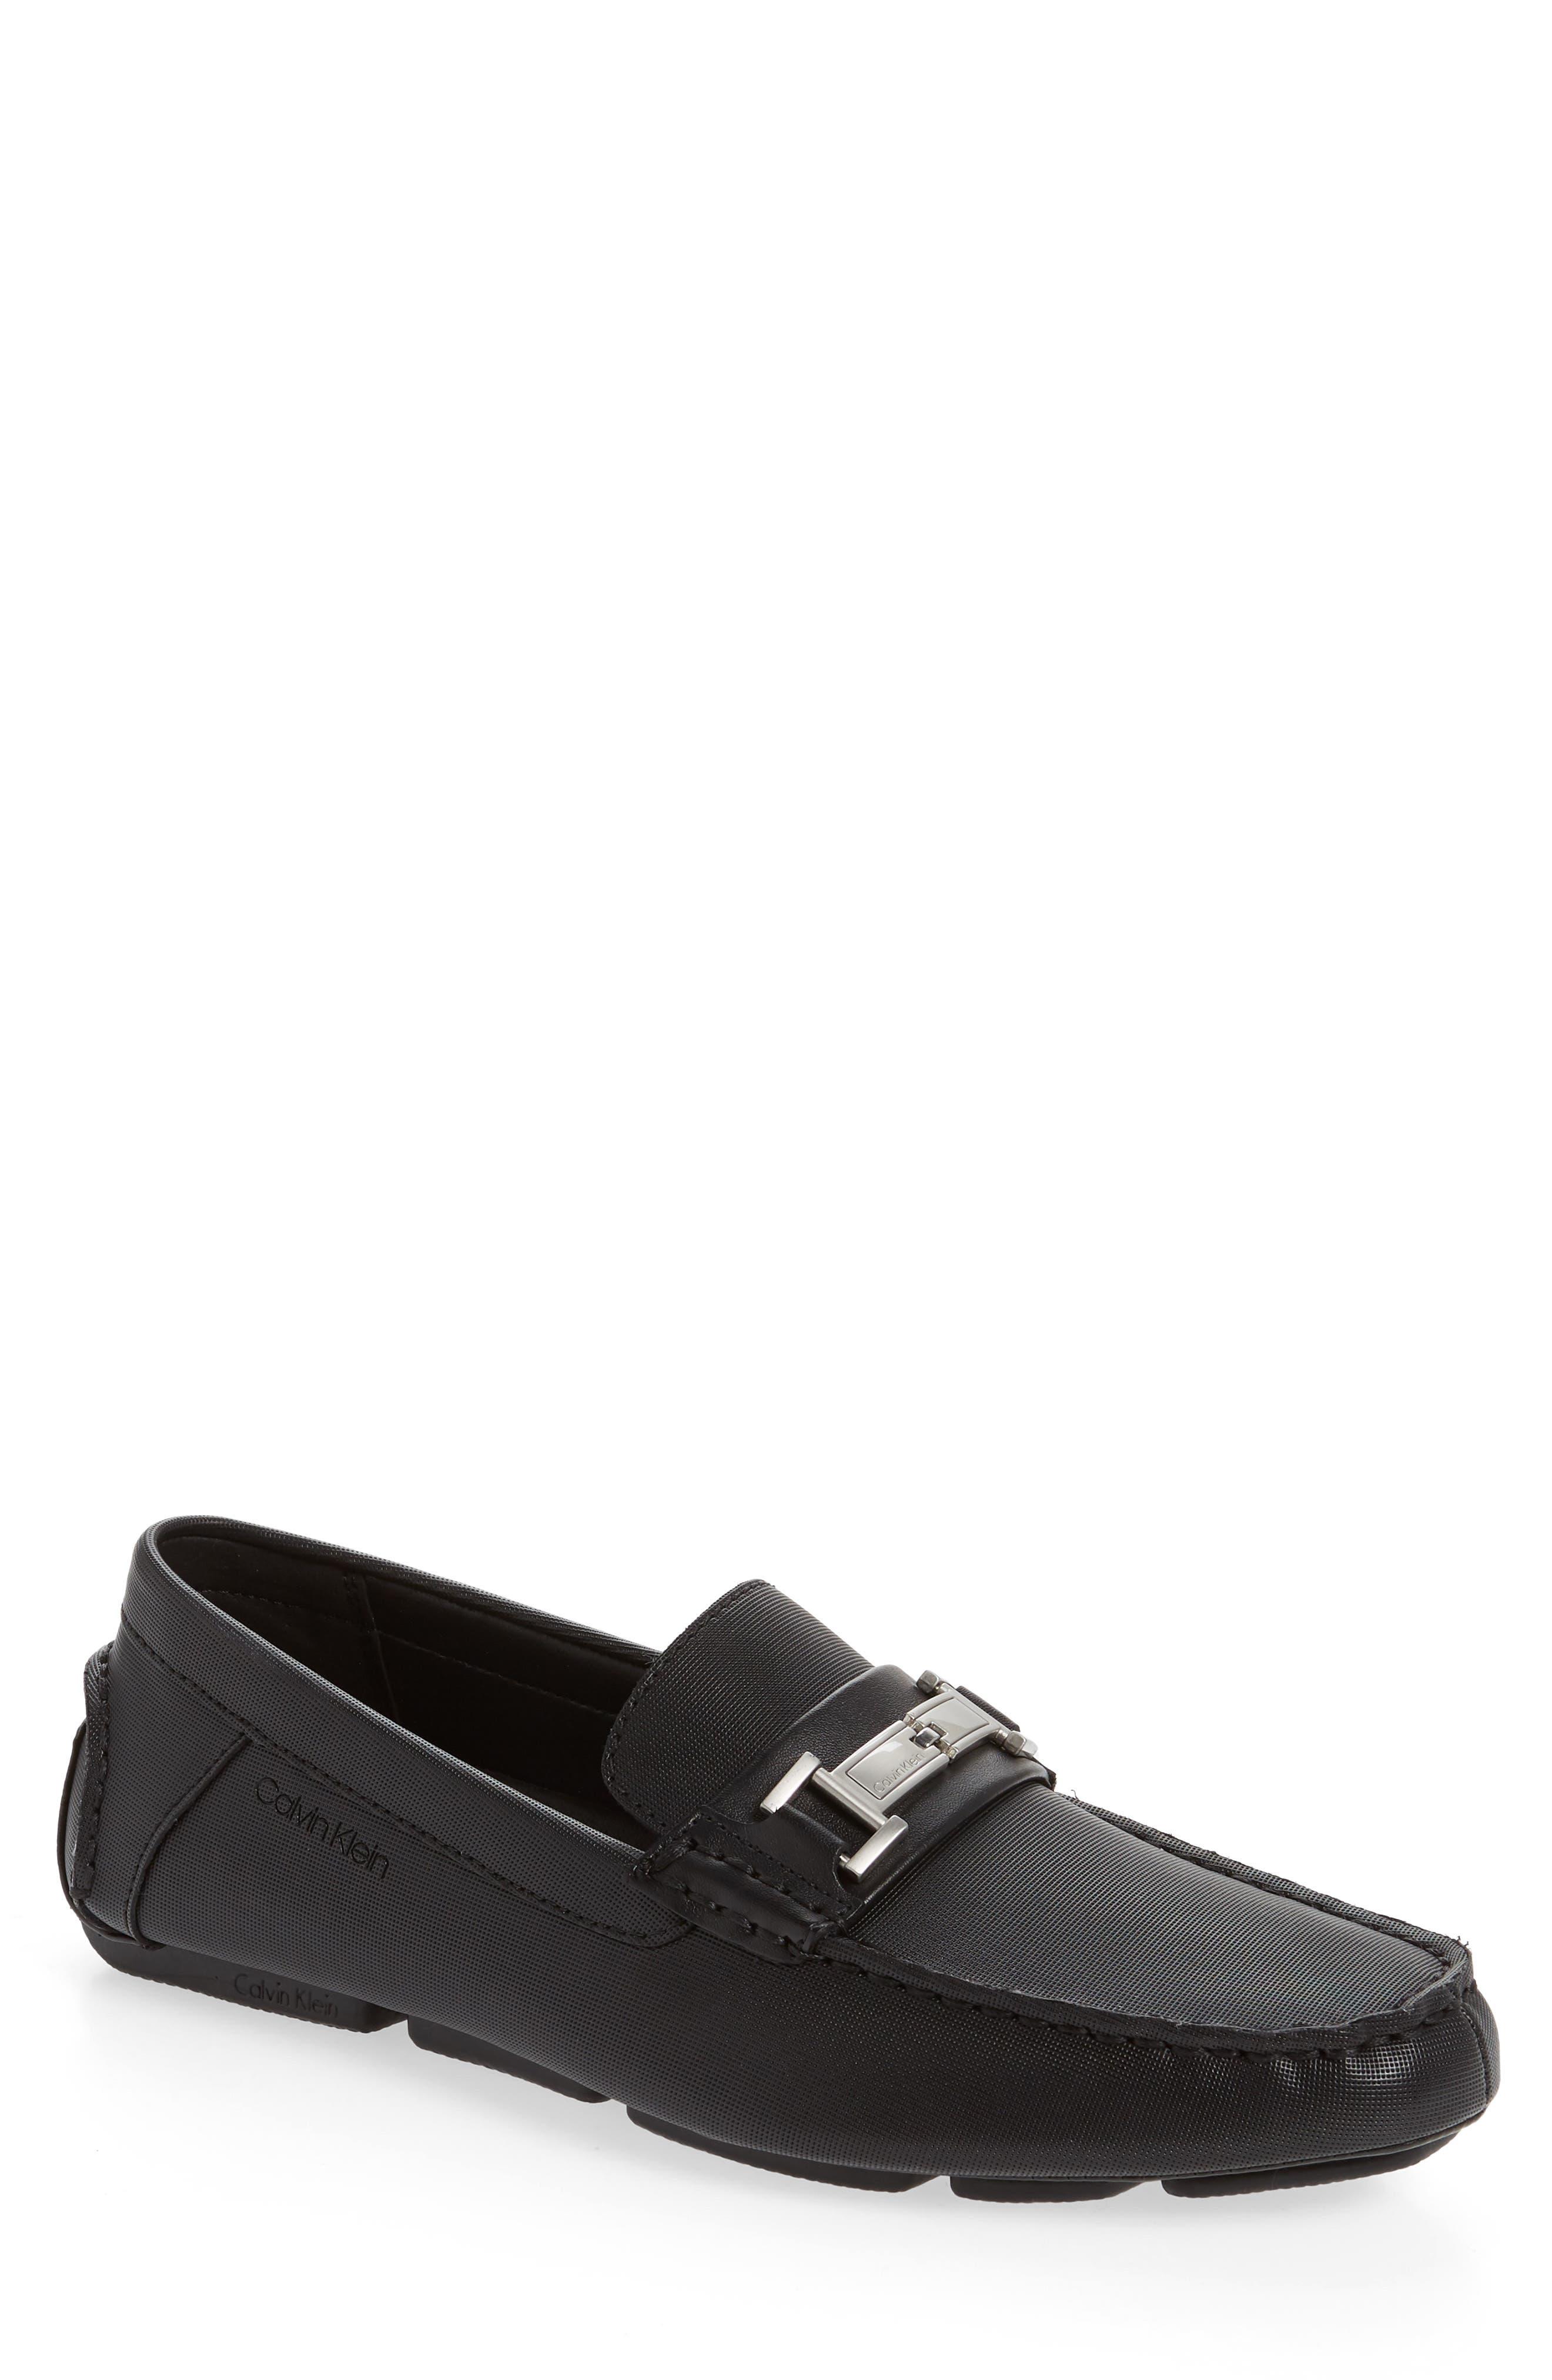 5ceb819f934 Men s Calvin Klein Shoes